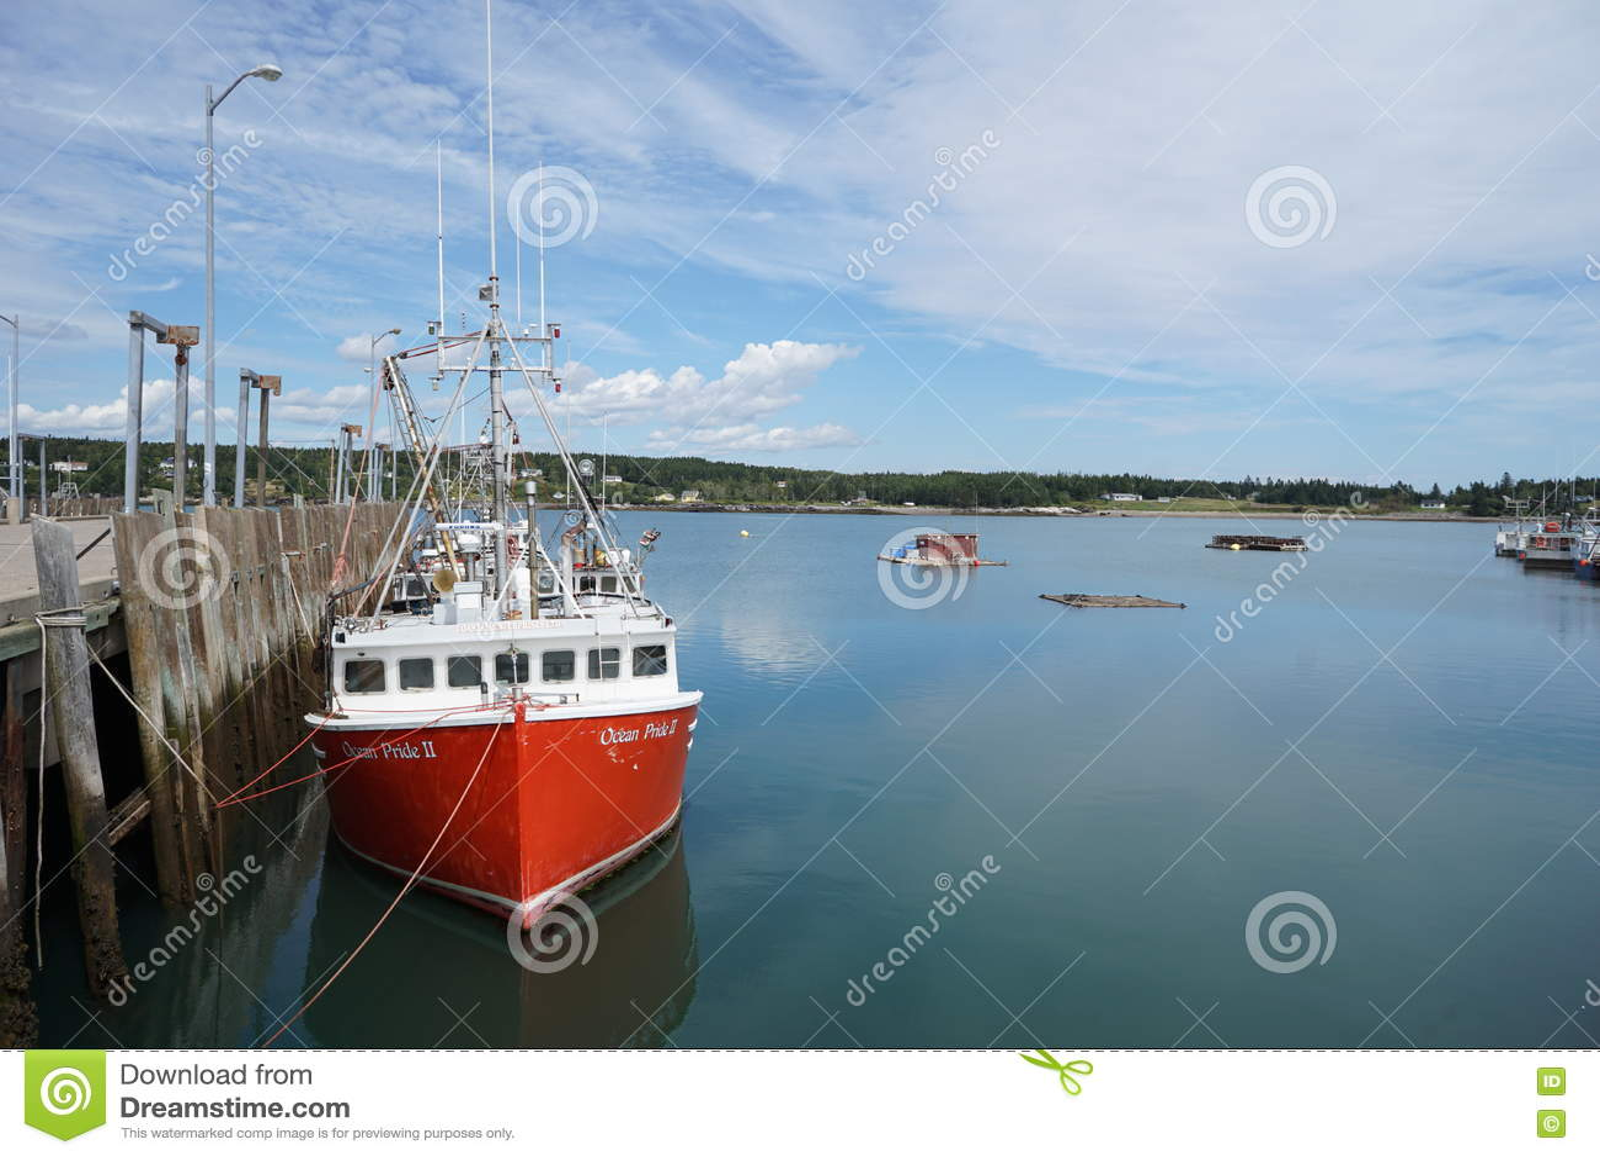 New Brunswick Fishing Village Editorial Stock Image - Image